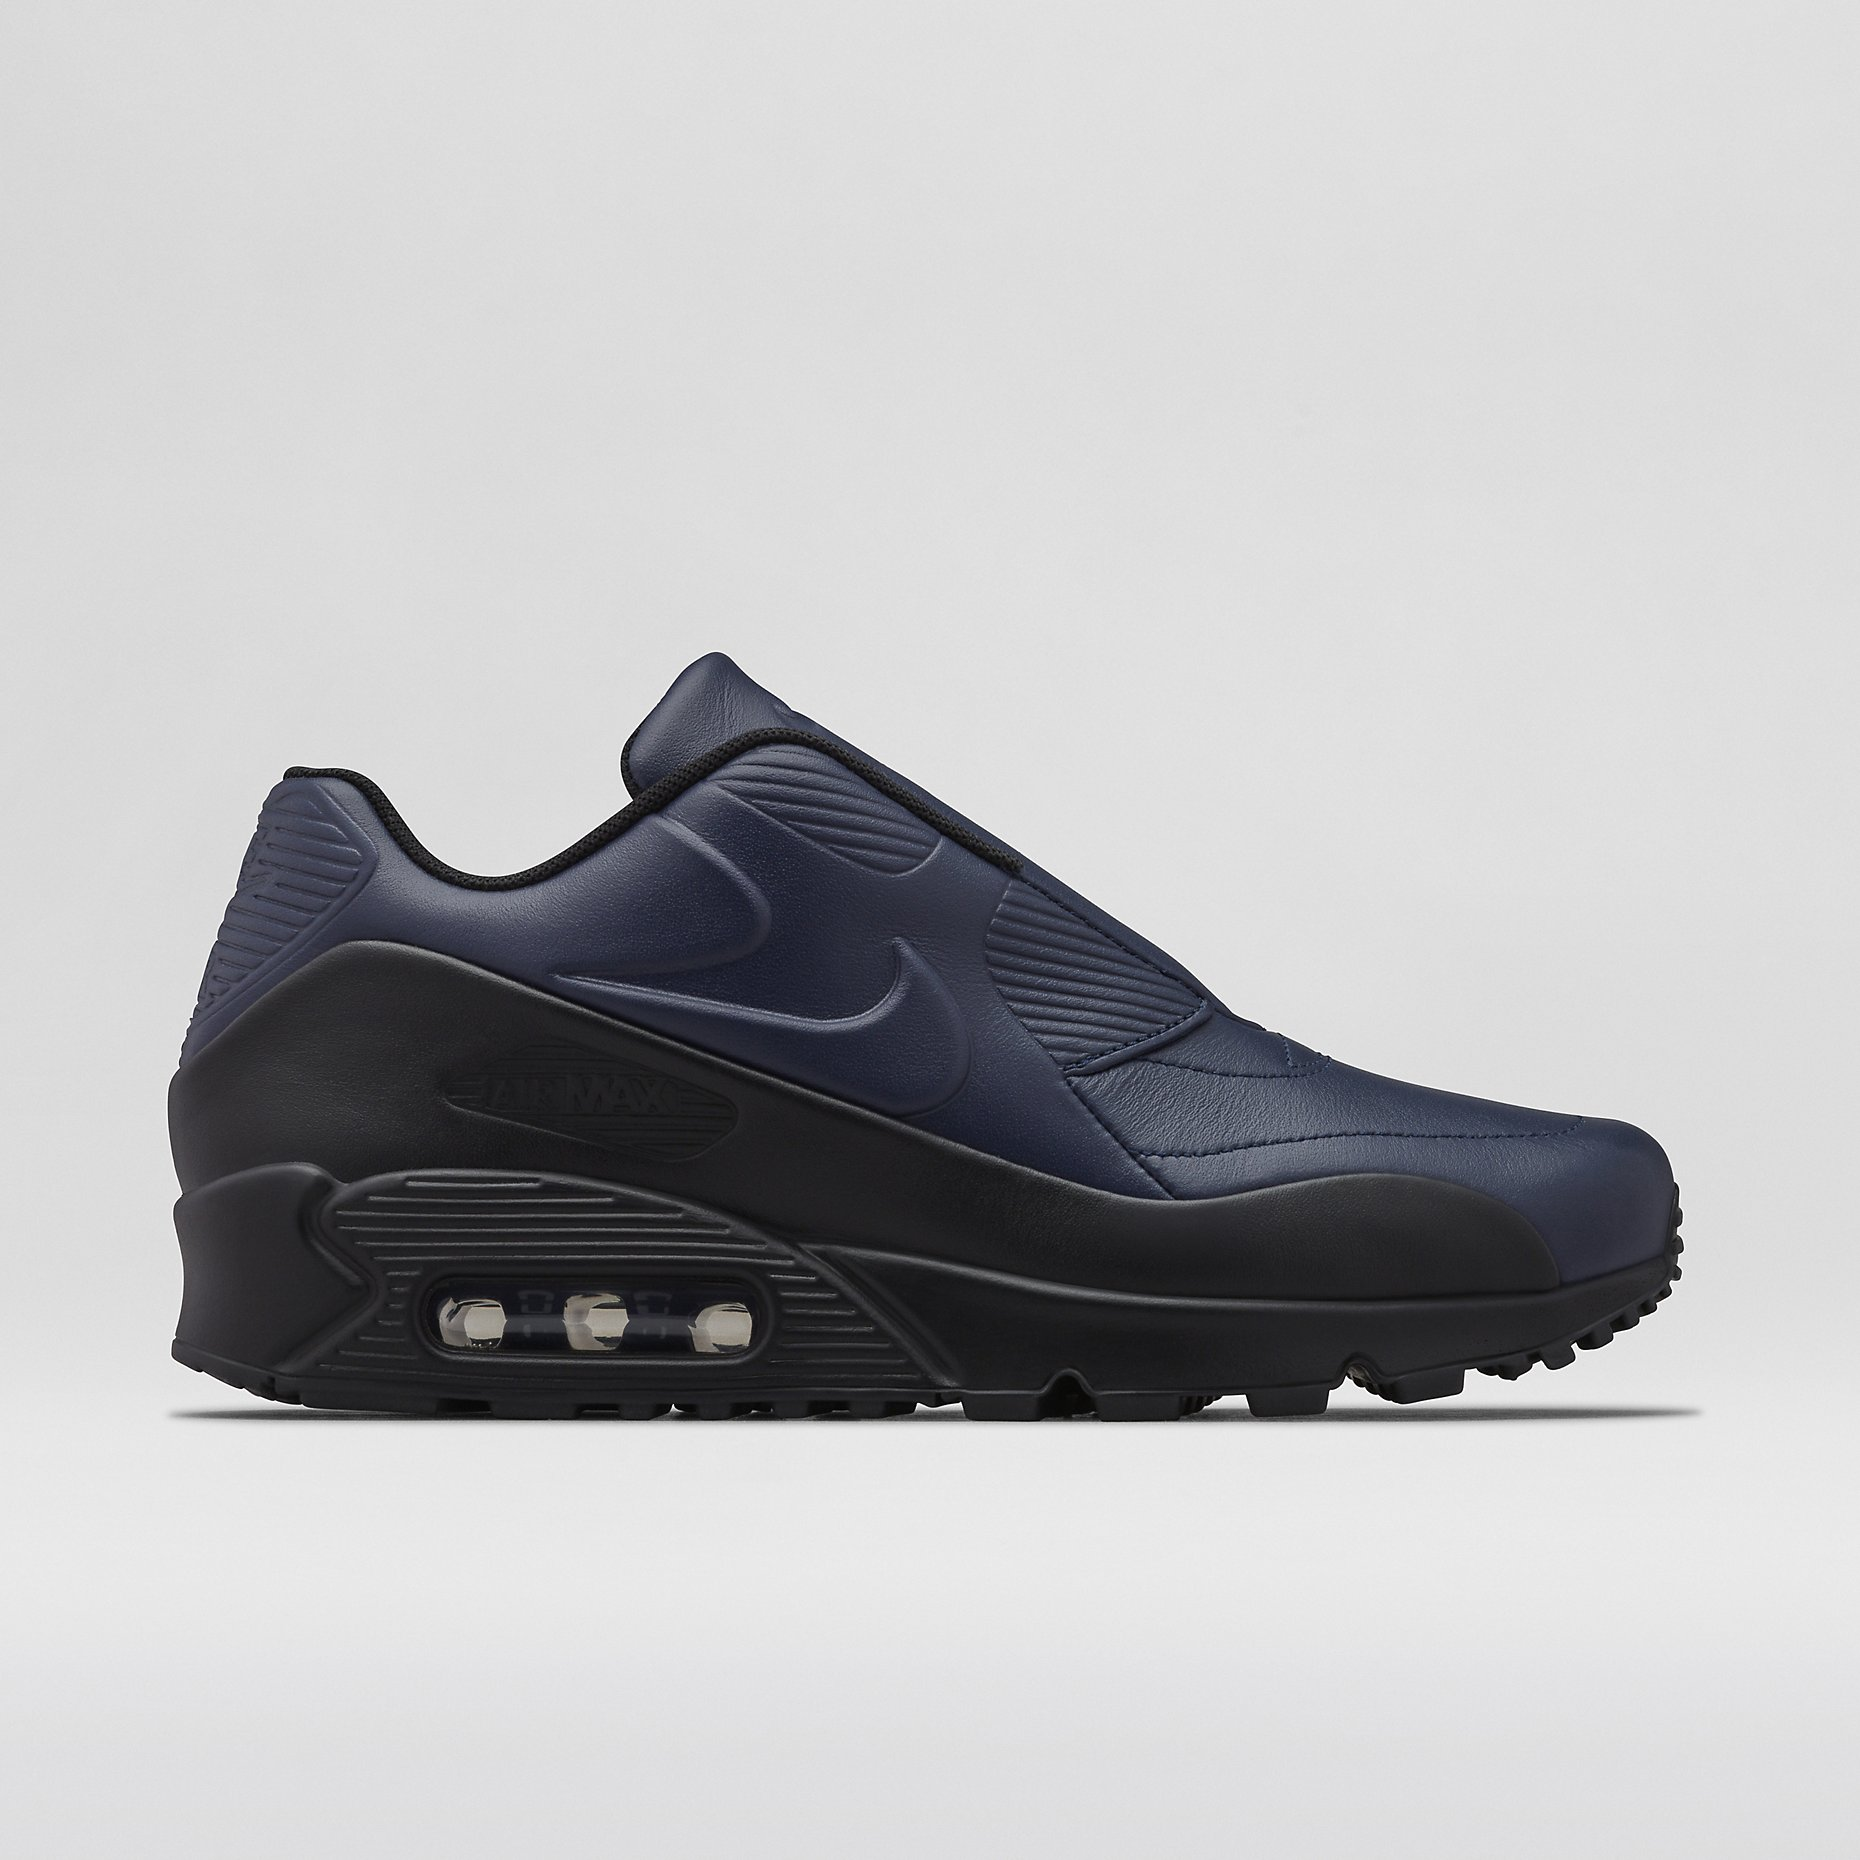 Very Goods | NikeLab x sacai Air Max 90 Damenschuh. Nike